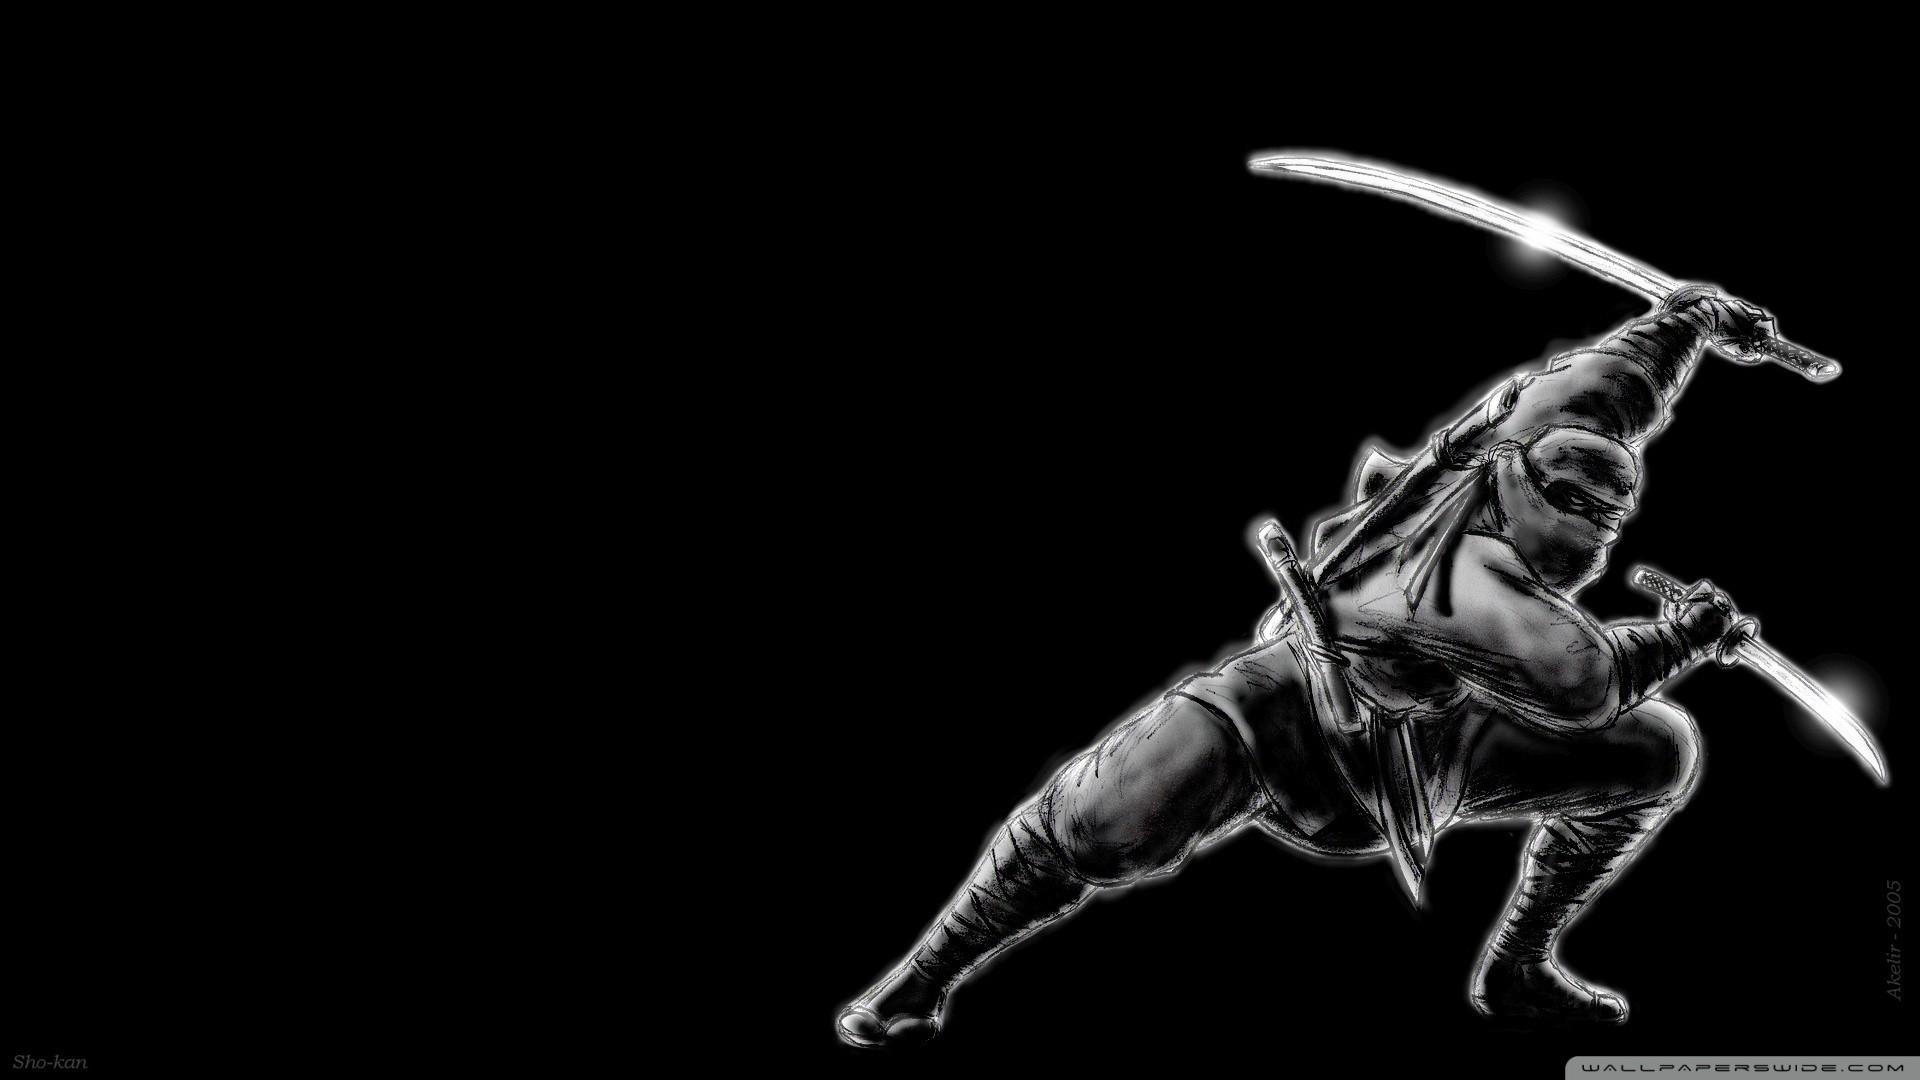 Ninja Wallpapers. 1920×1080